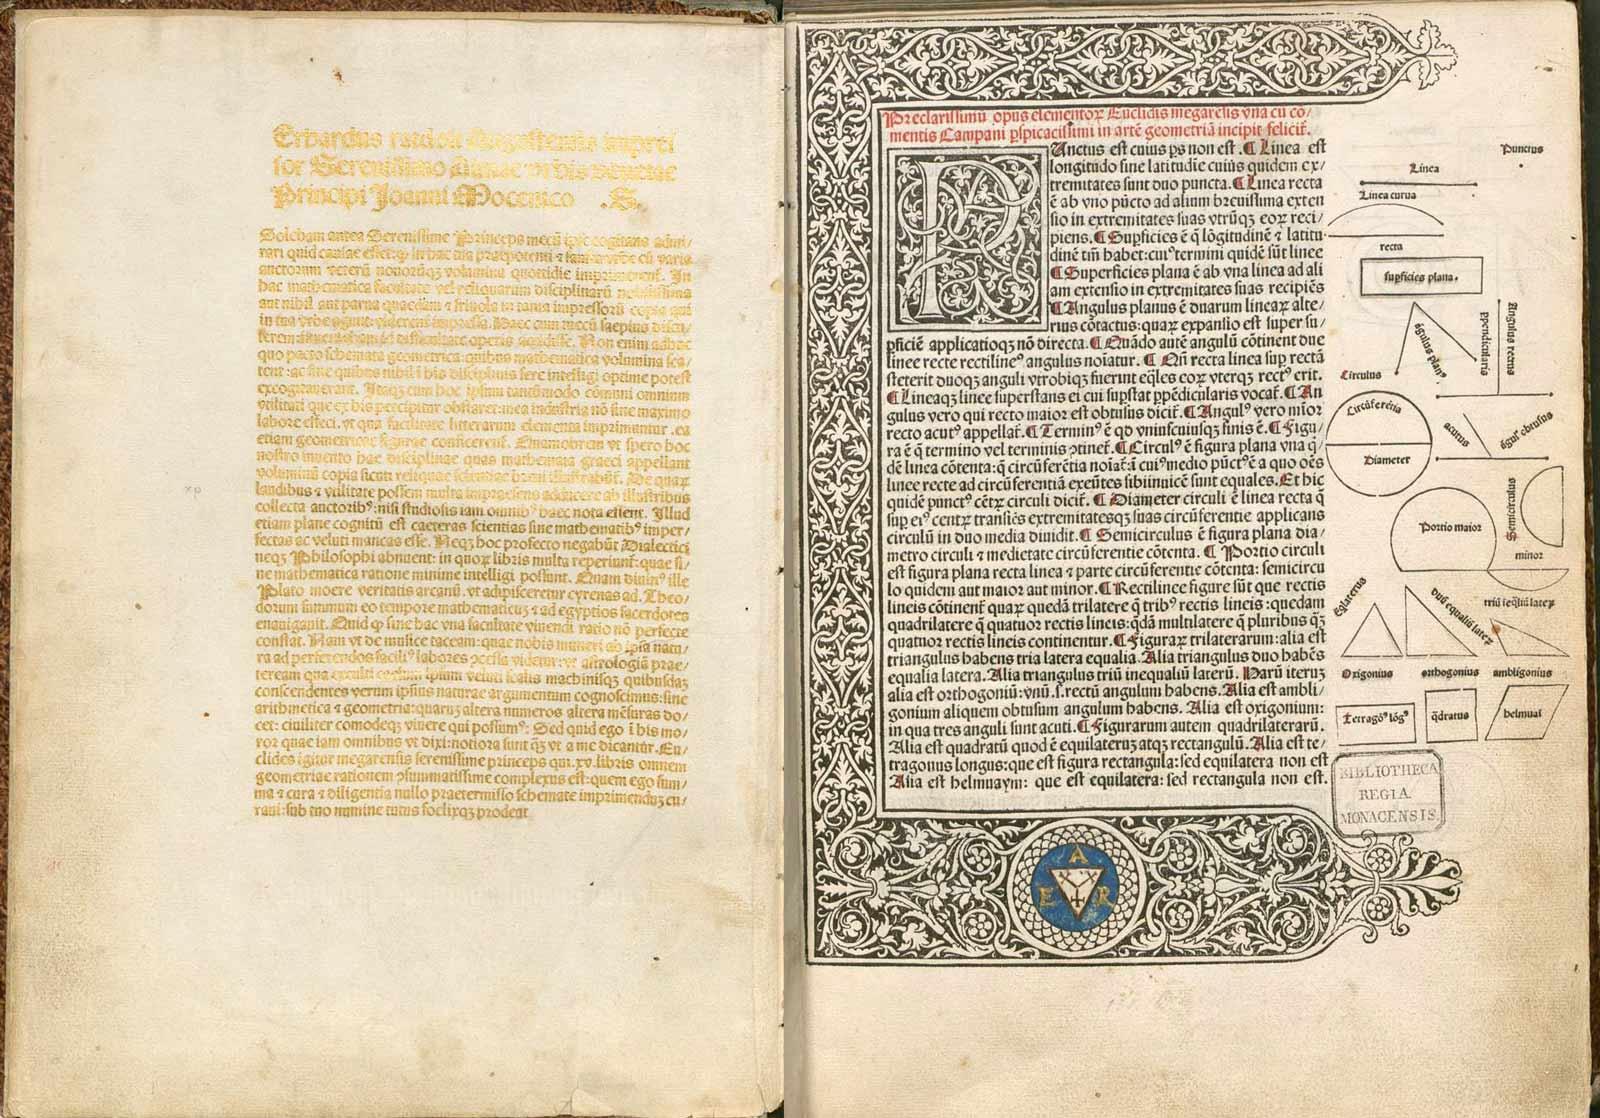 elements-ratdolt-1482-gold-dedication